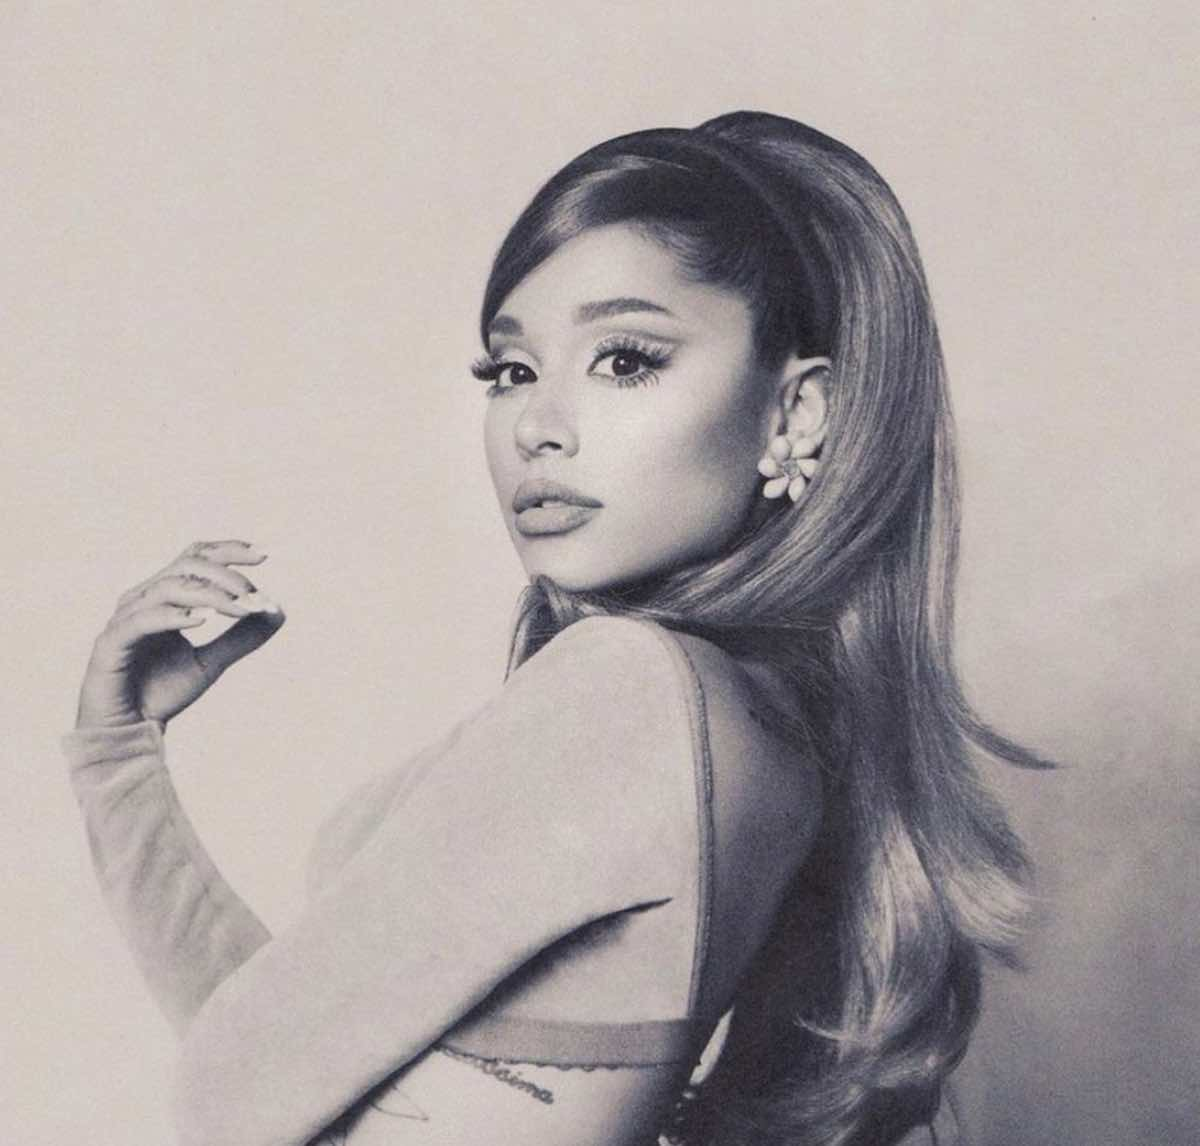 Ariana Grande sbarca su Netflix: in arrivo il documentario Sweetener Tour